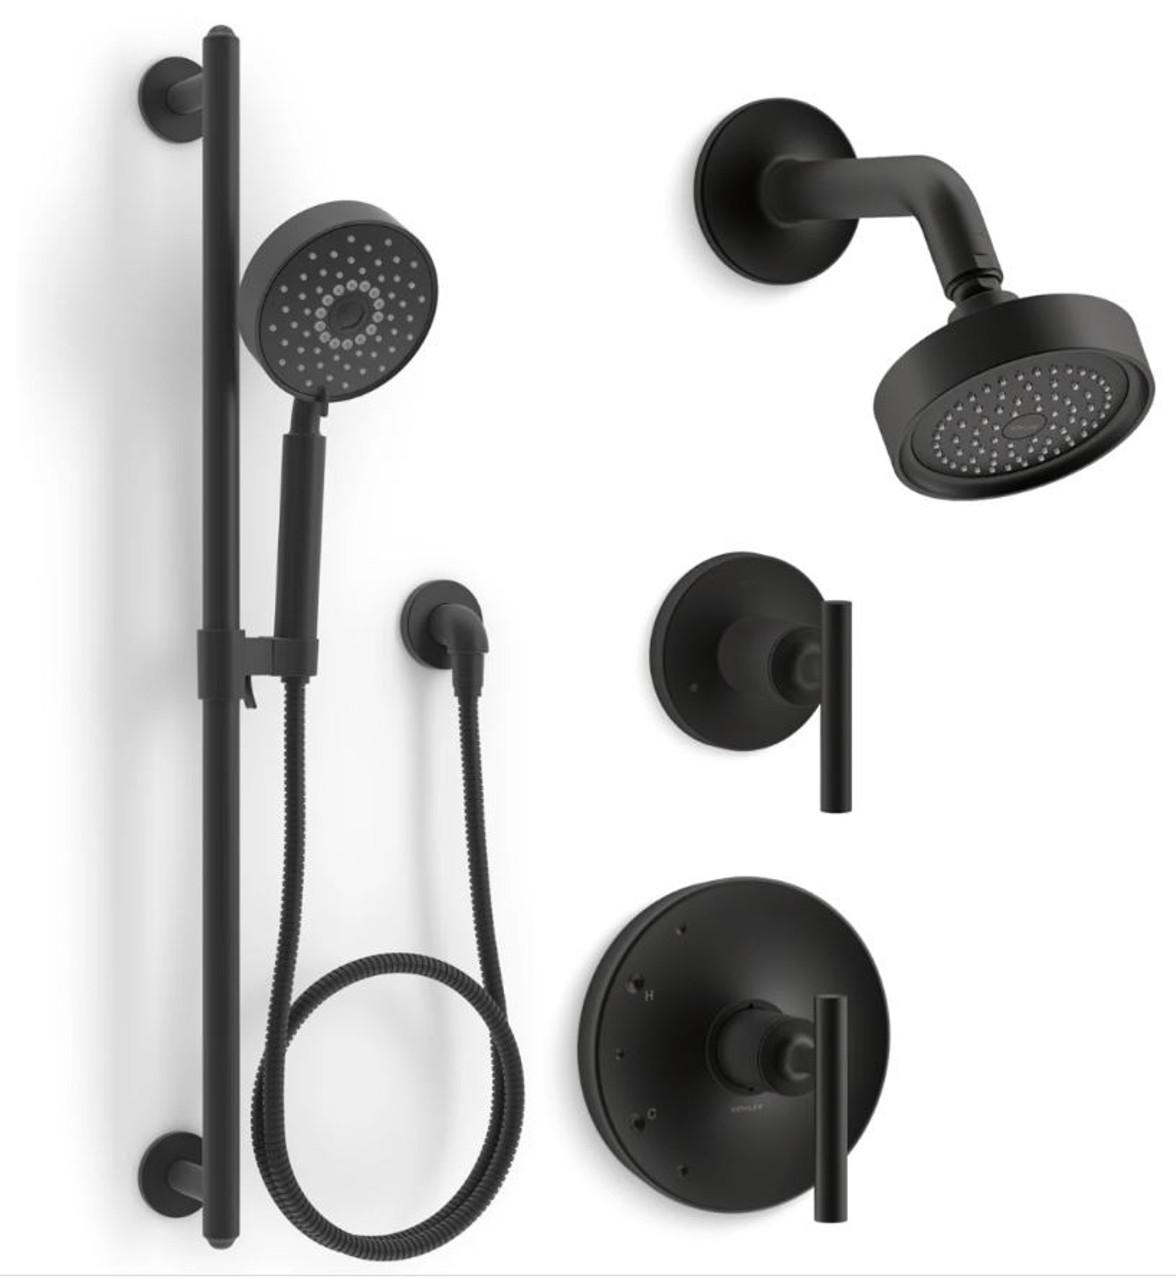 kohler purist pressure balanced shower system with shower head hand shower valve trim and shower arm